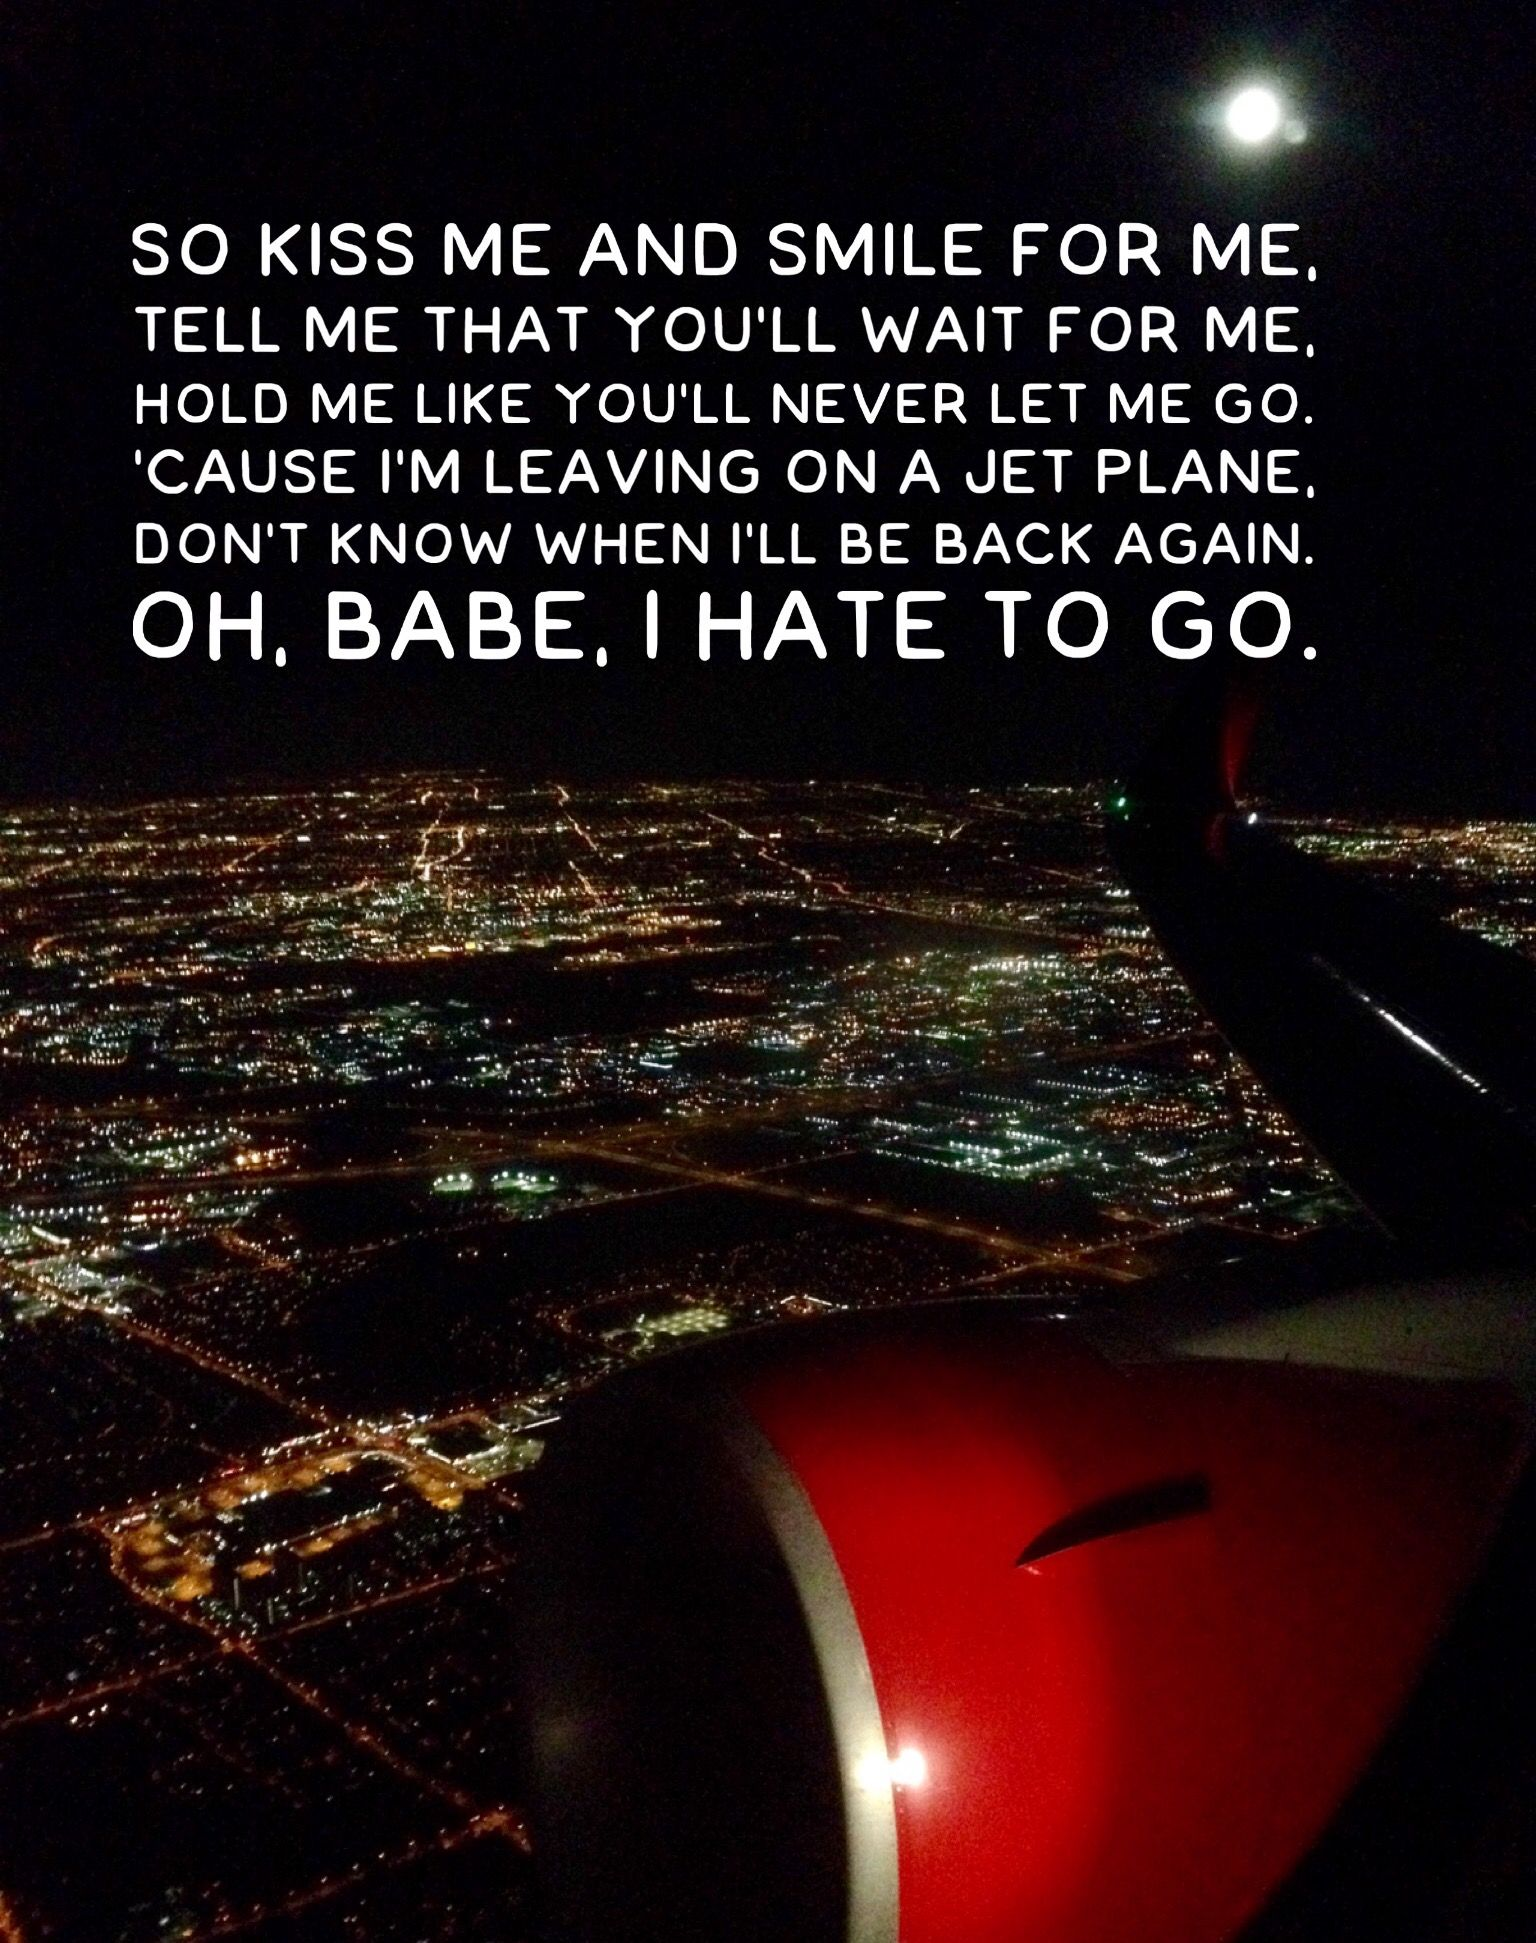 Long distance romance lyrics